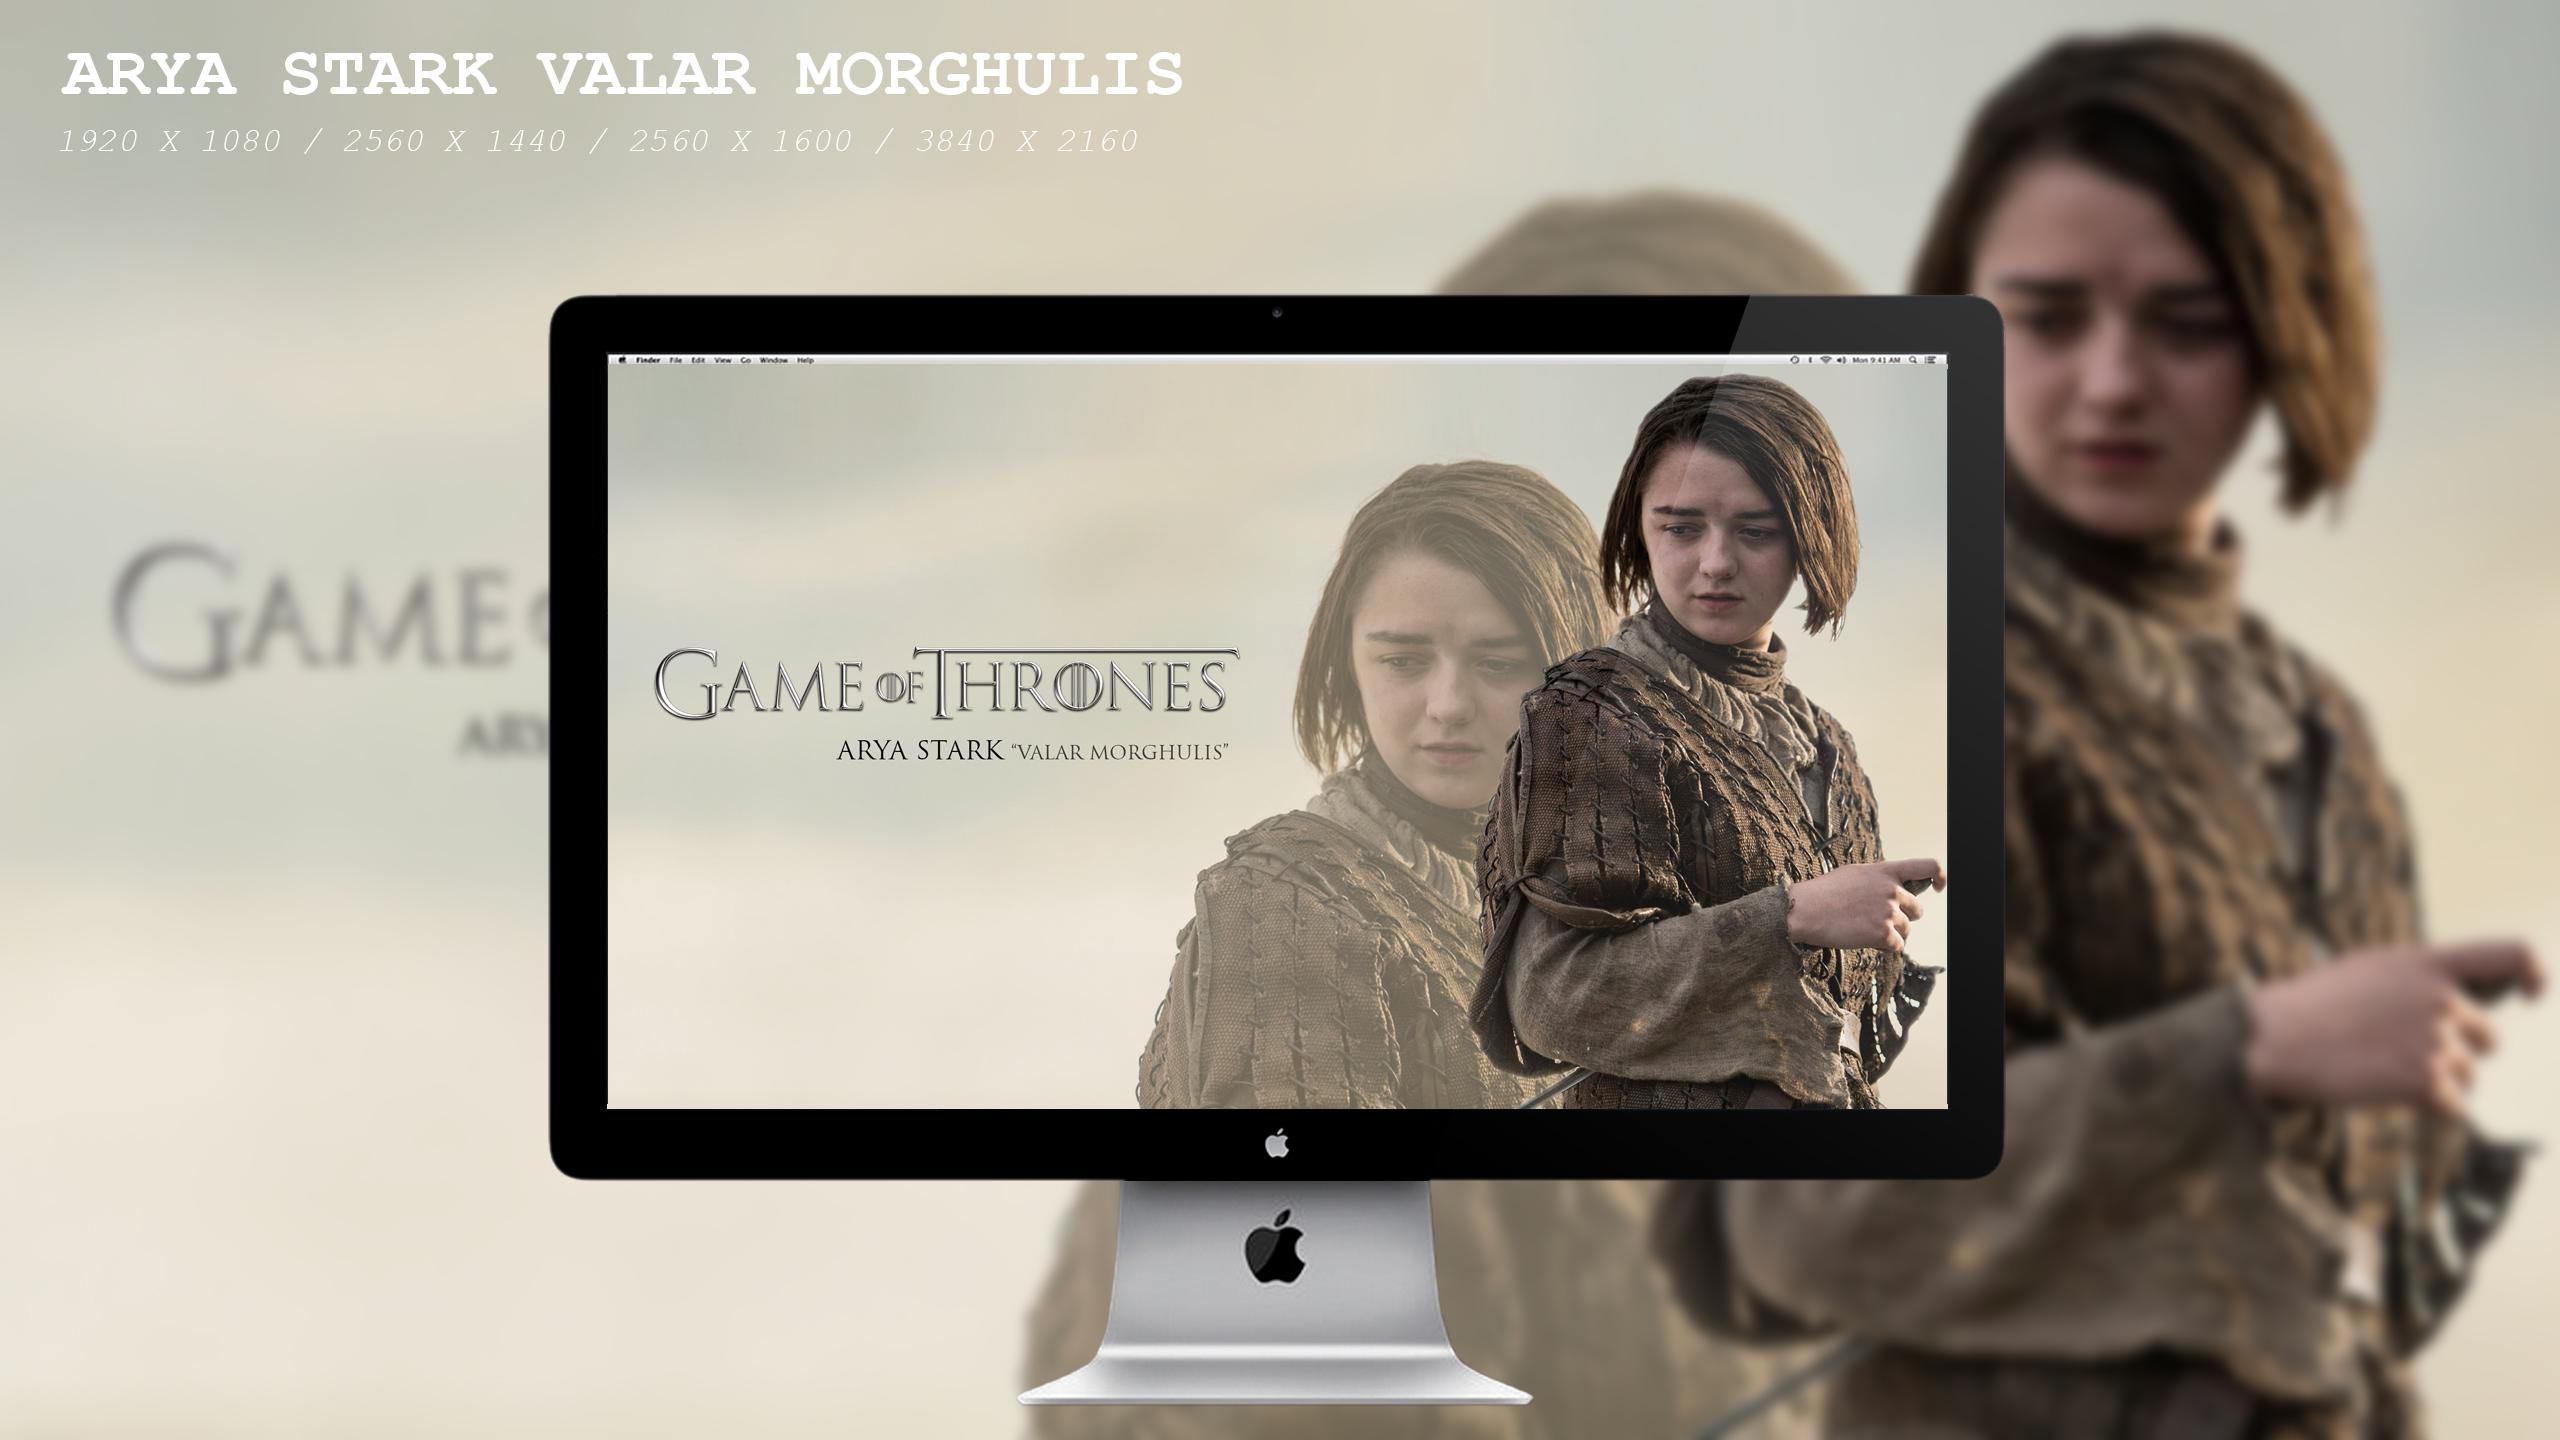 Arya Stark Valar Morghulis Wallpaper Hd By Beaware8 On